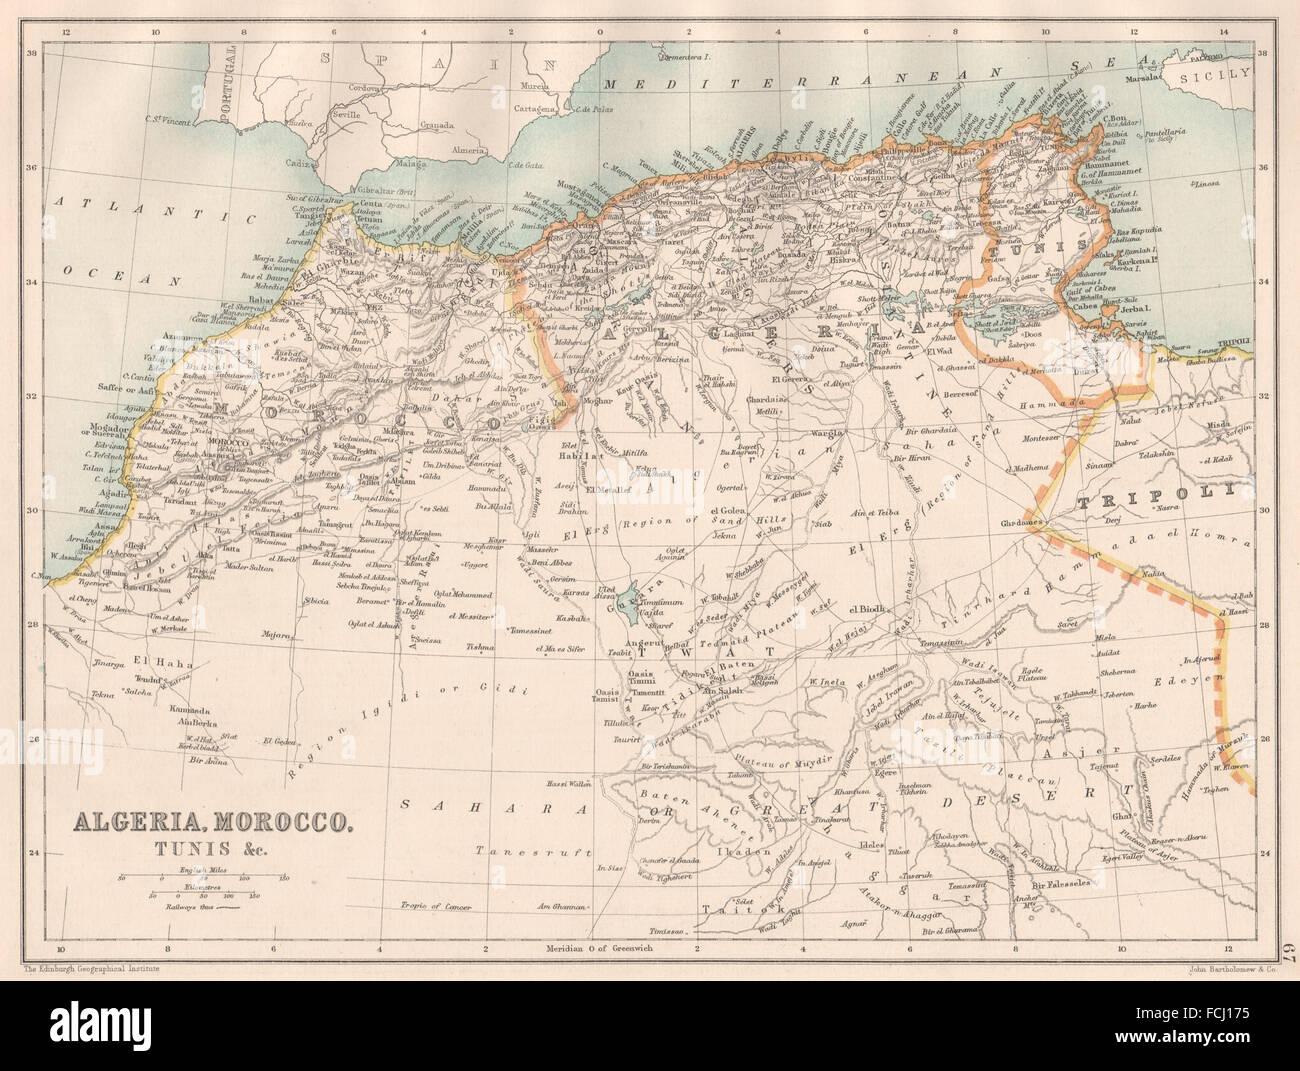 North africa algeria morocco tunis tunisia maghreb bartholomew north africa algeria morocco tunis tunisia maghreb bartholomew 1891 old map gumiabroncs Image collections